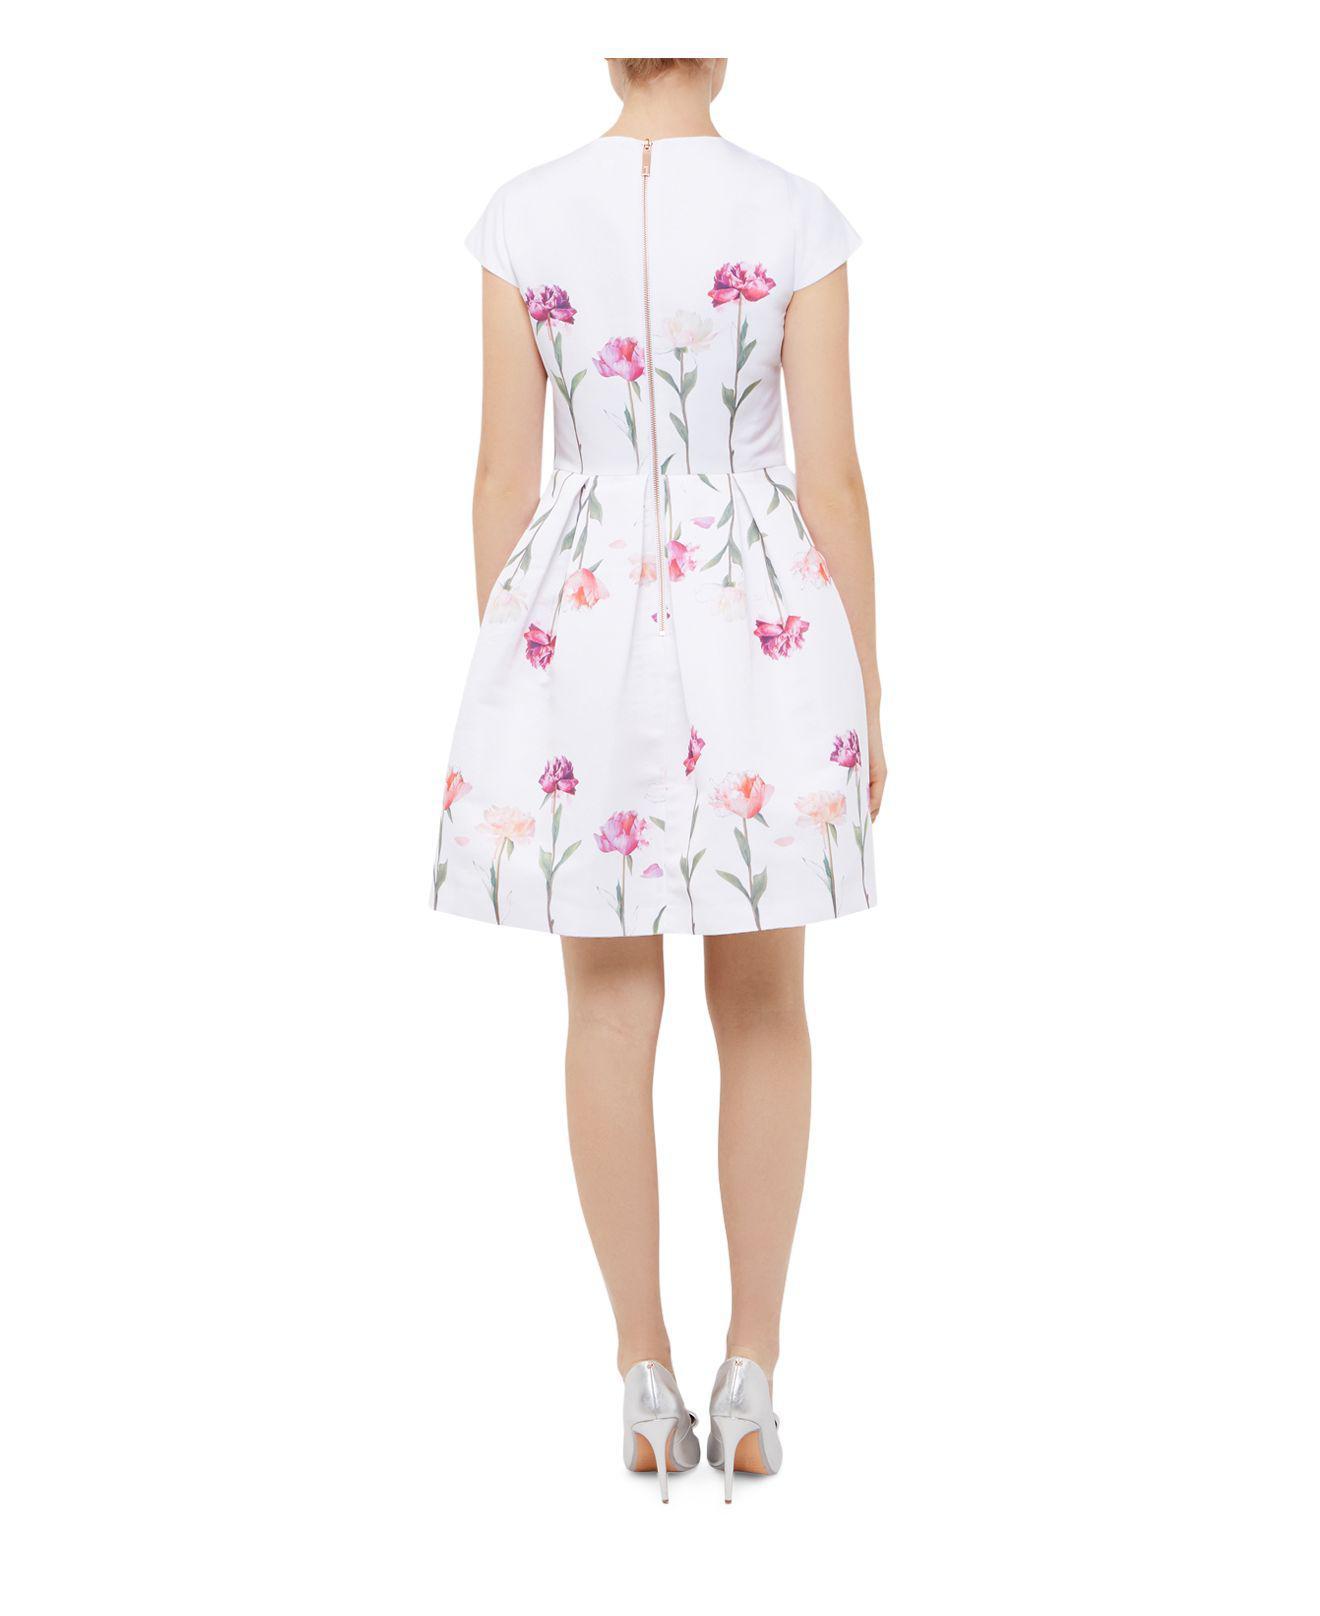 3985cc24a18b4 Lyst - Ted Baker Callila Sketchbook Dress in White